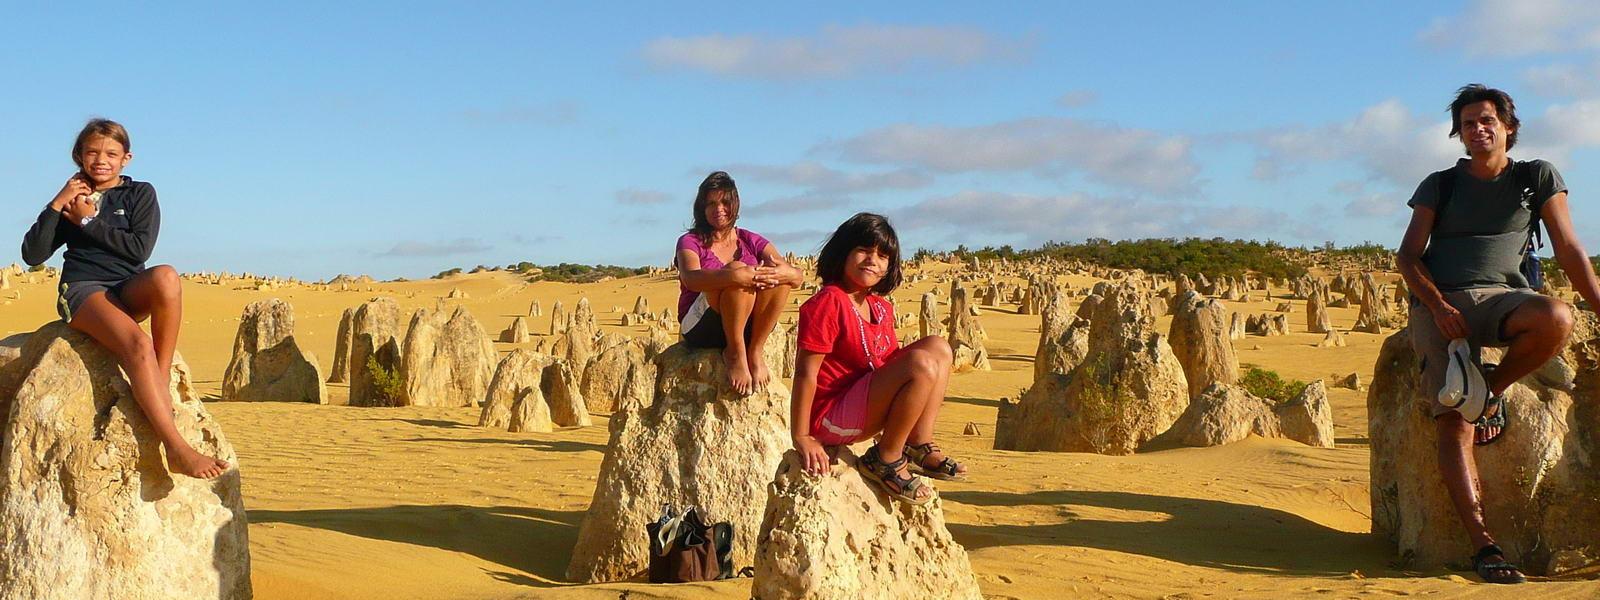 Sami skozi avstralsko divjino